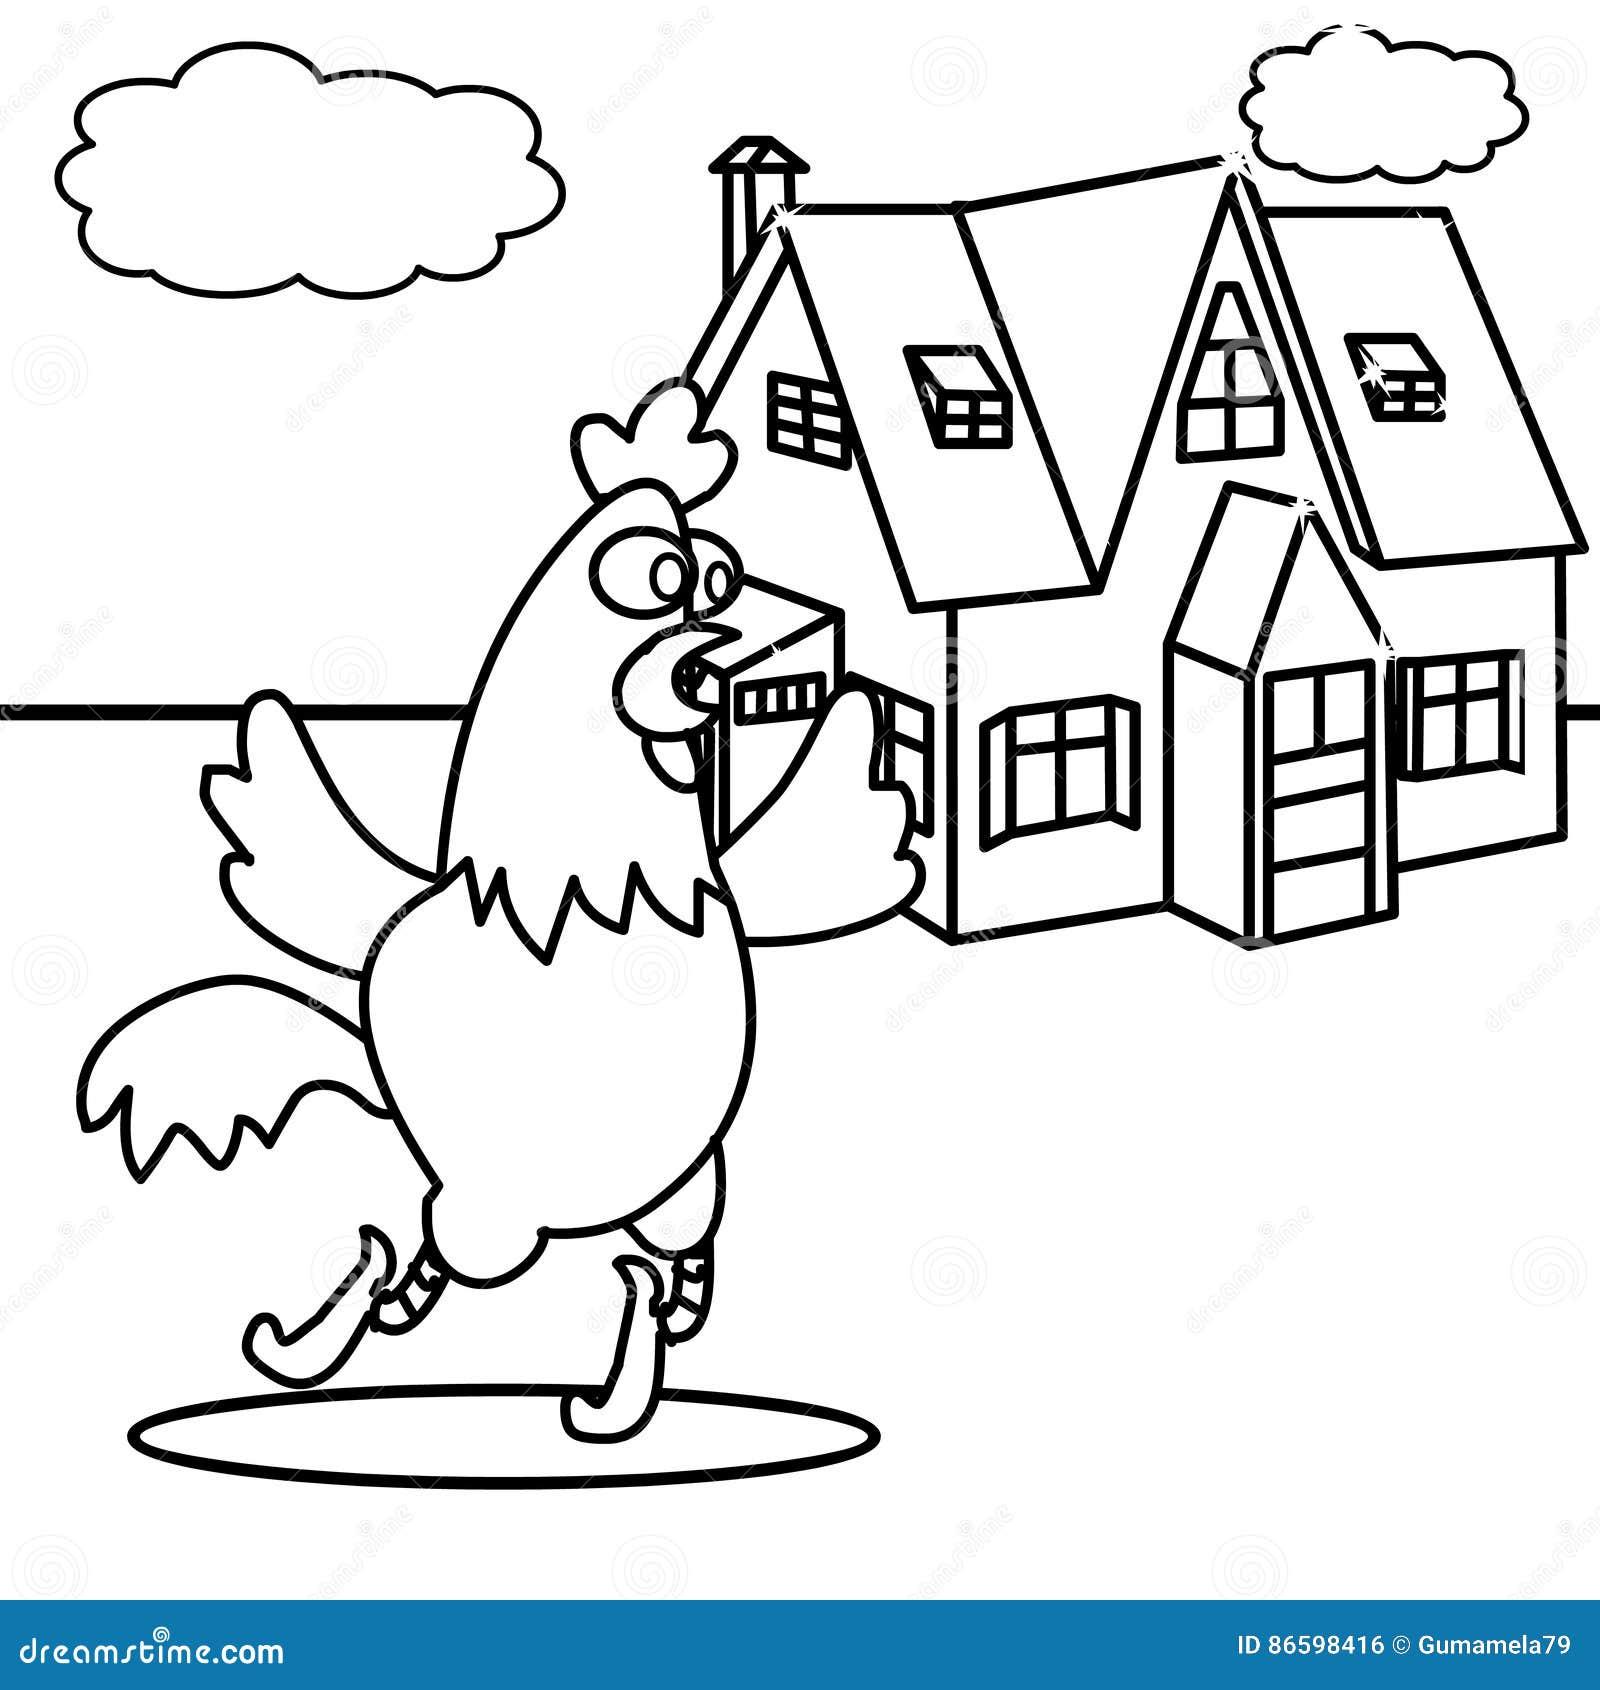 Chicken House Stock Illustrations 5 365 Chicken House Stock Illustrations Vectors Clipart Dreamstime